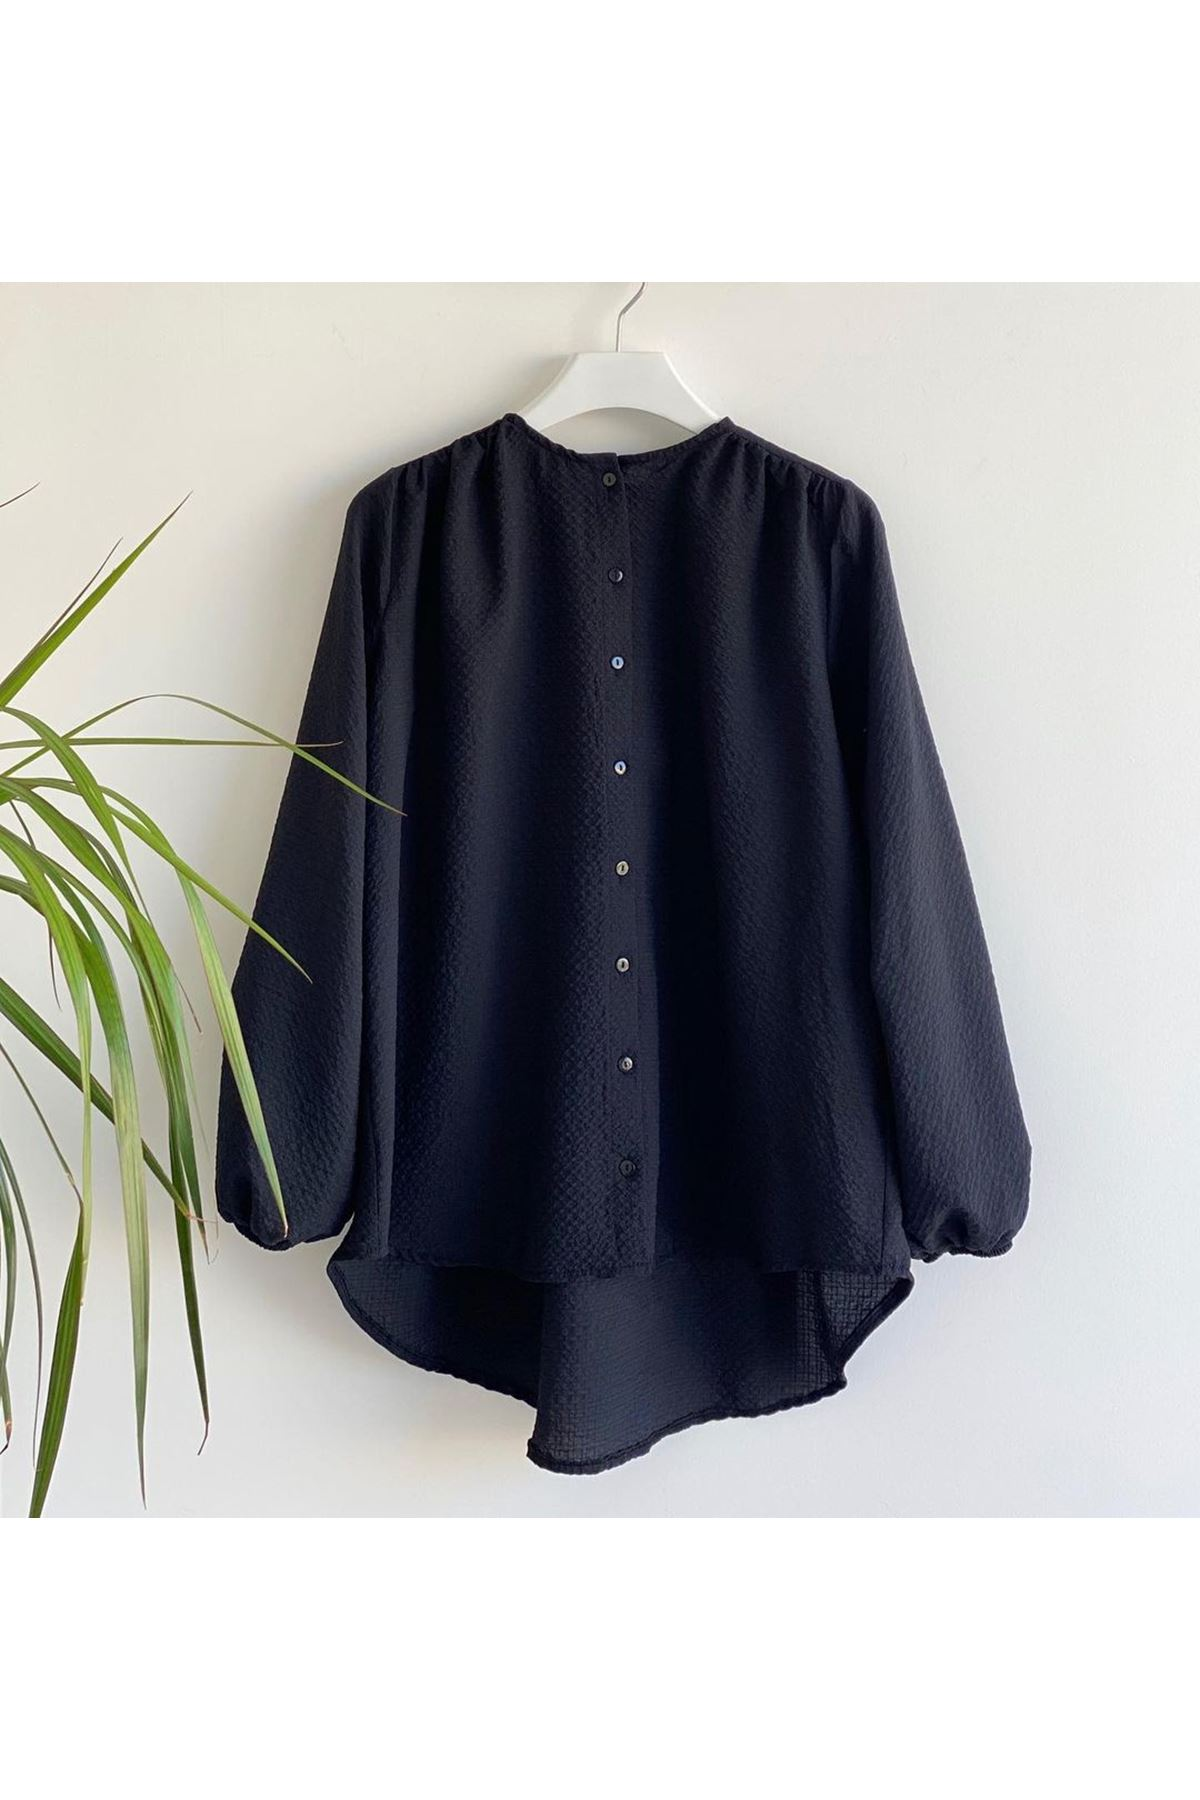 Kadın Kabartma Bluz - Siyah